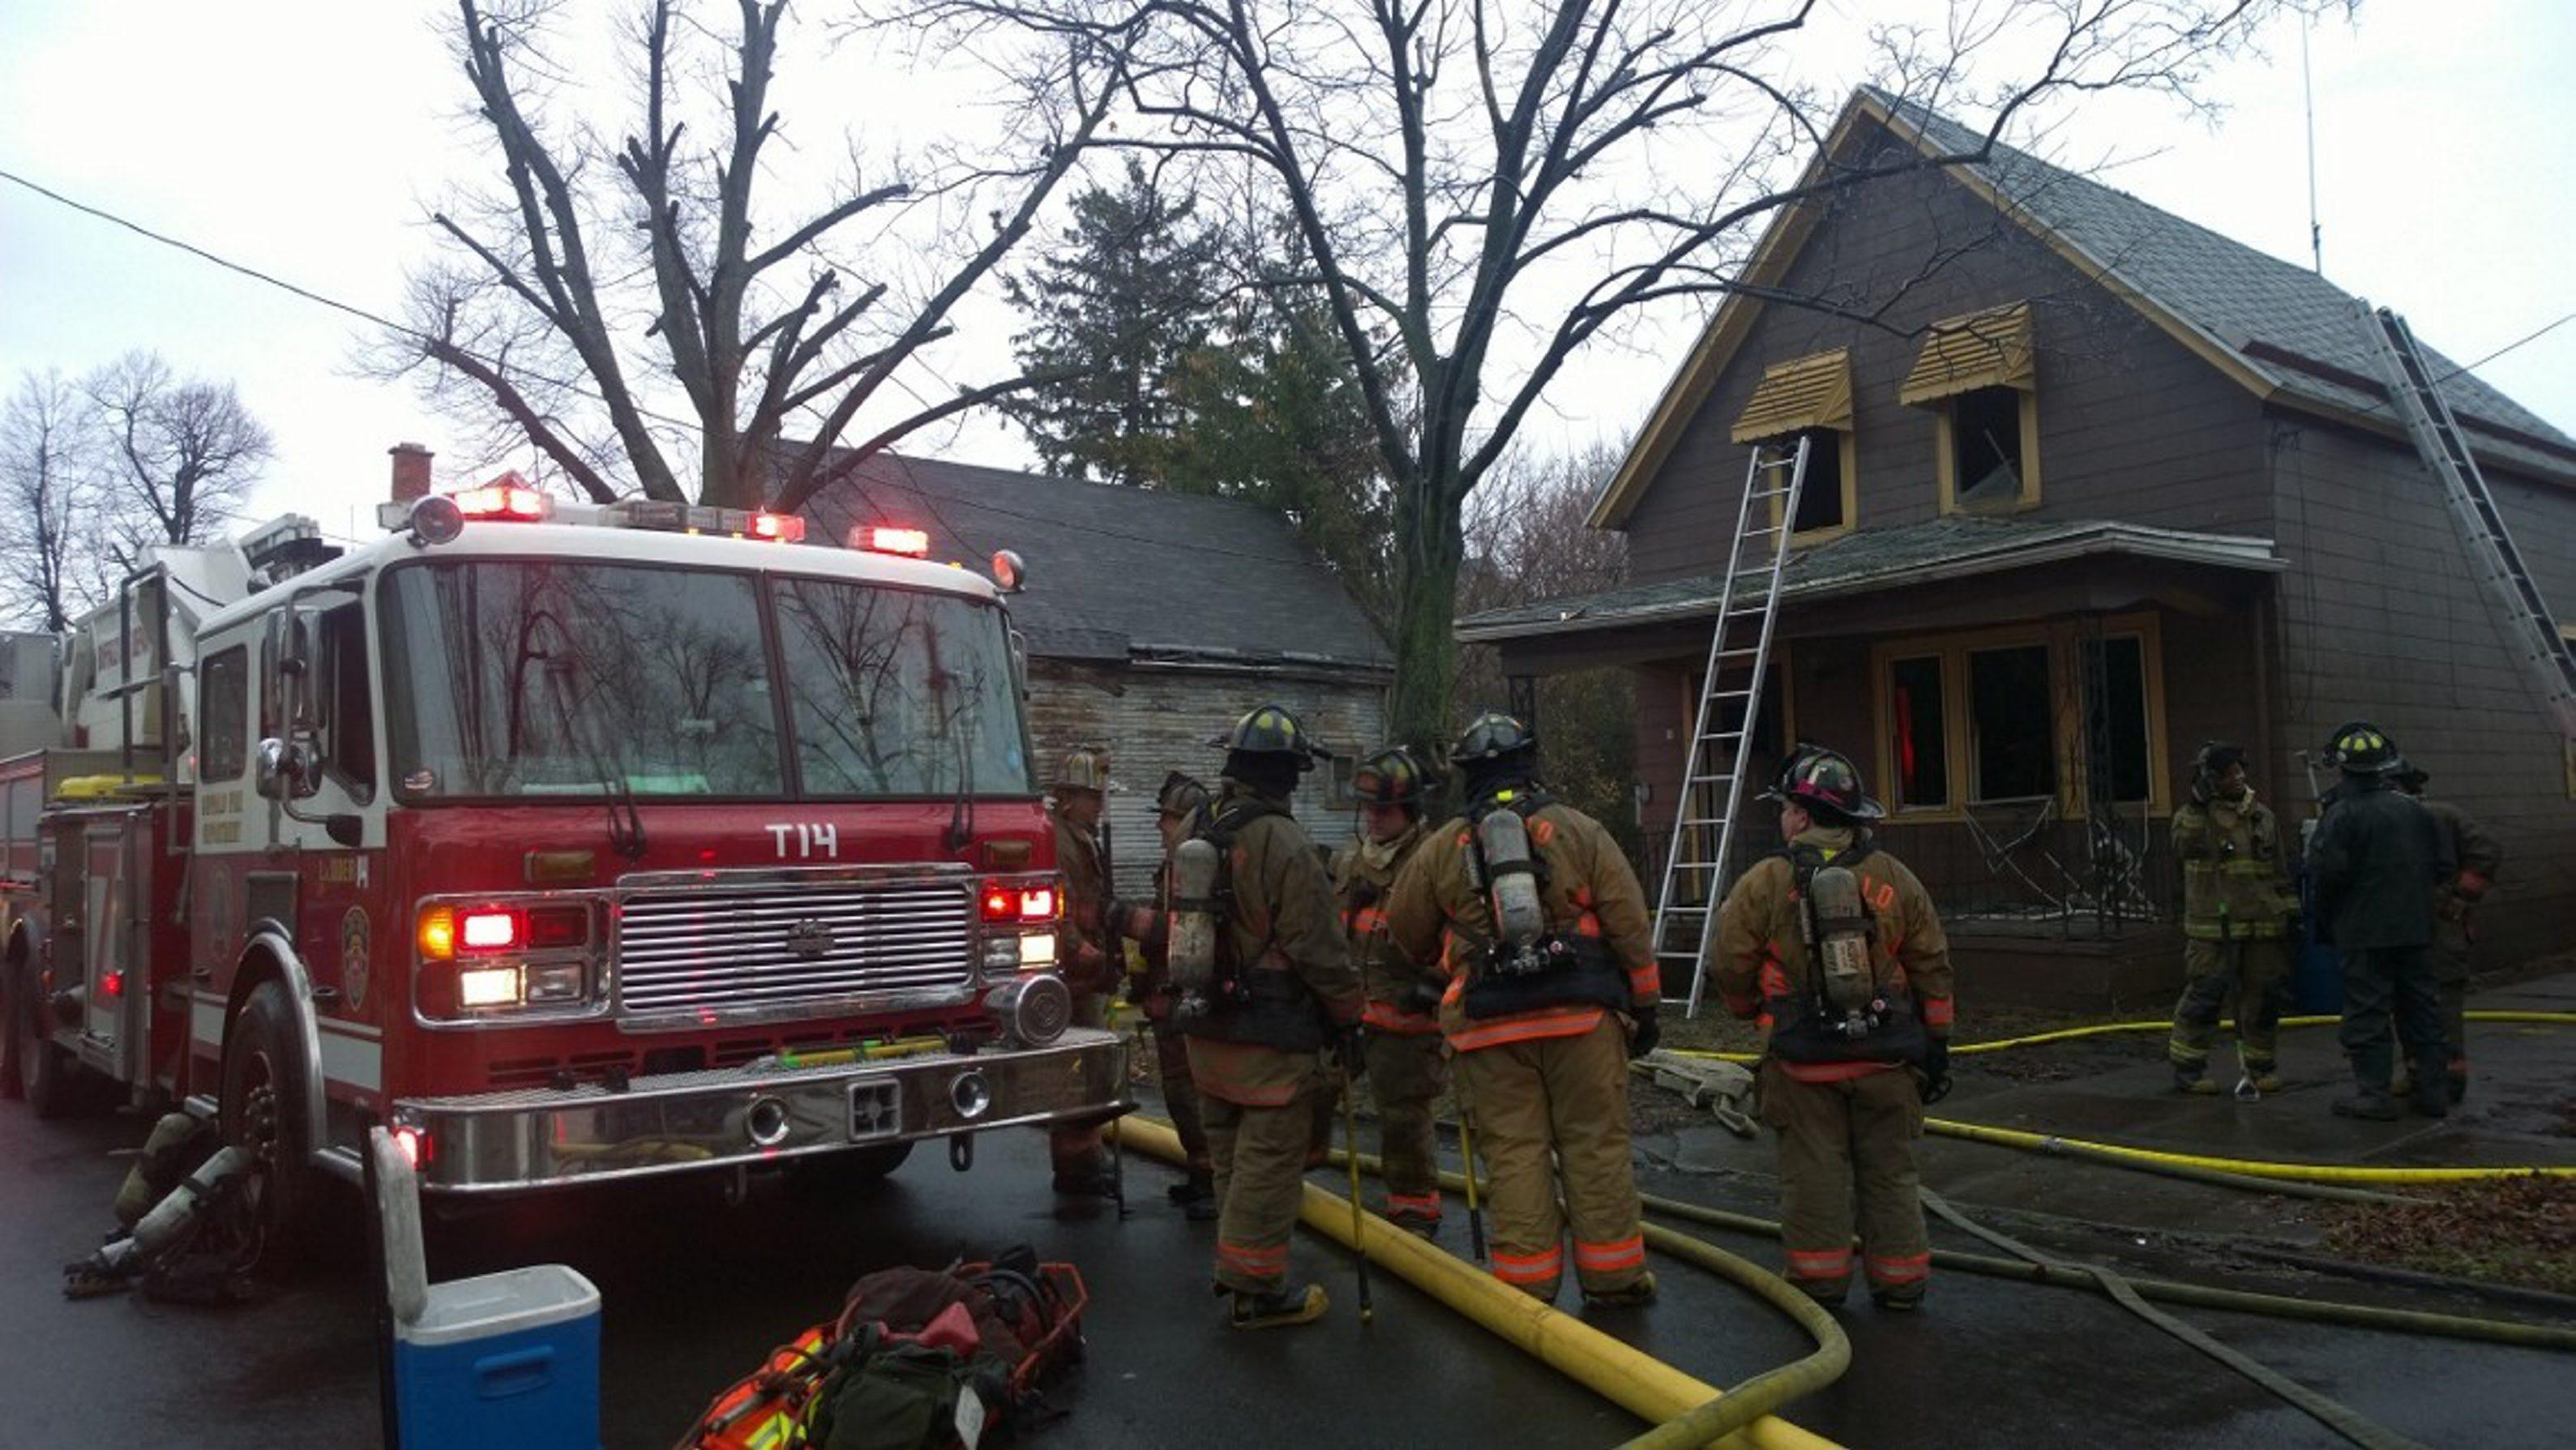 Firefighters at the scene of Tuesday's blaze on Keystone Street. (David Kazmierczak/Special to The News)